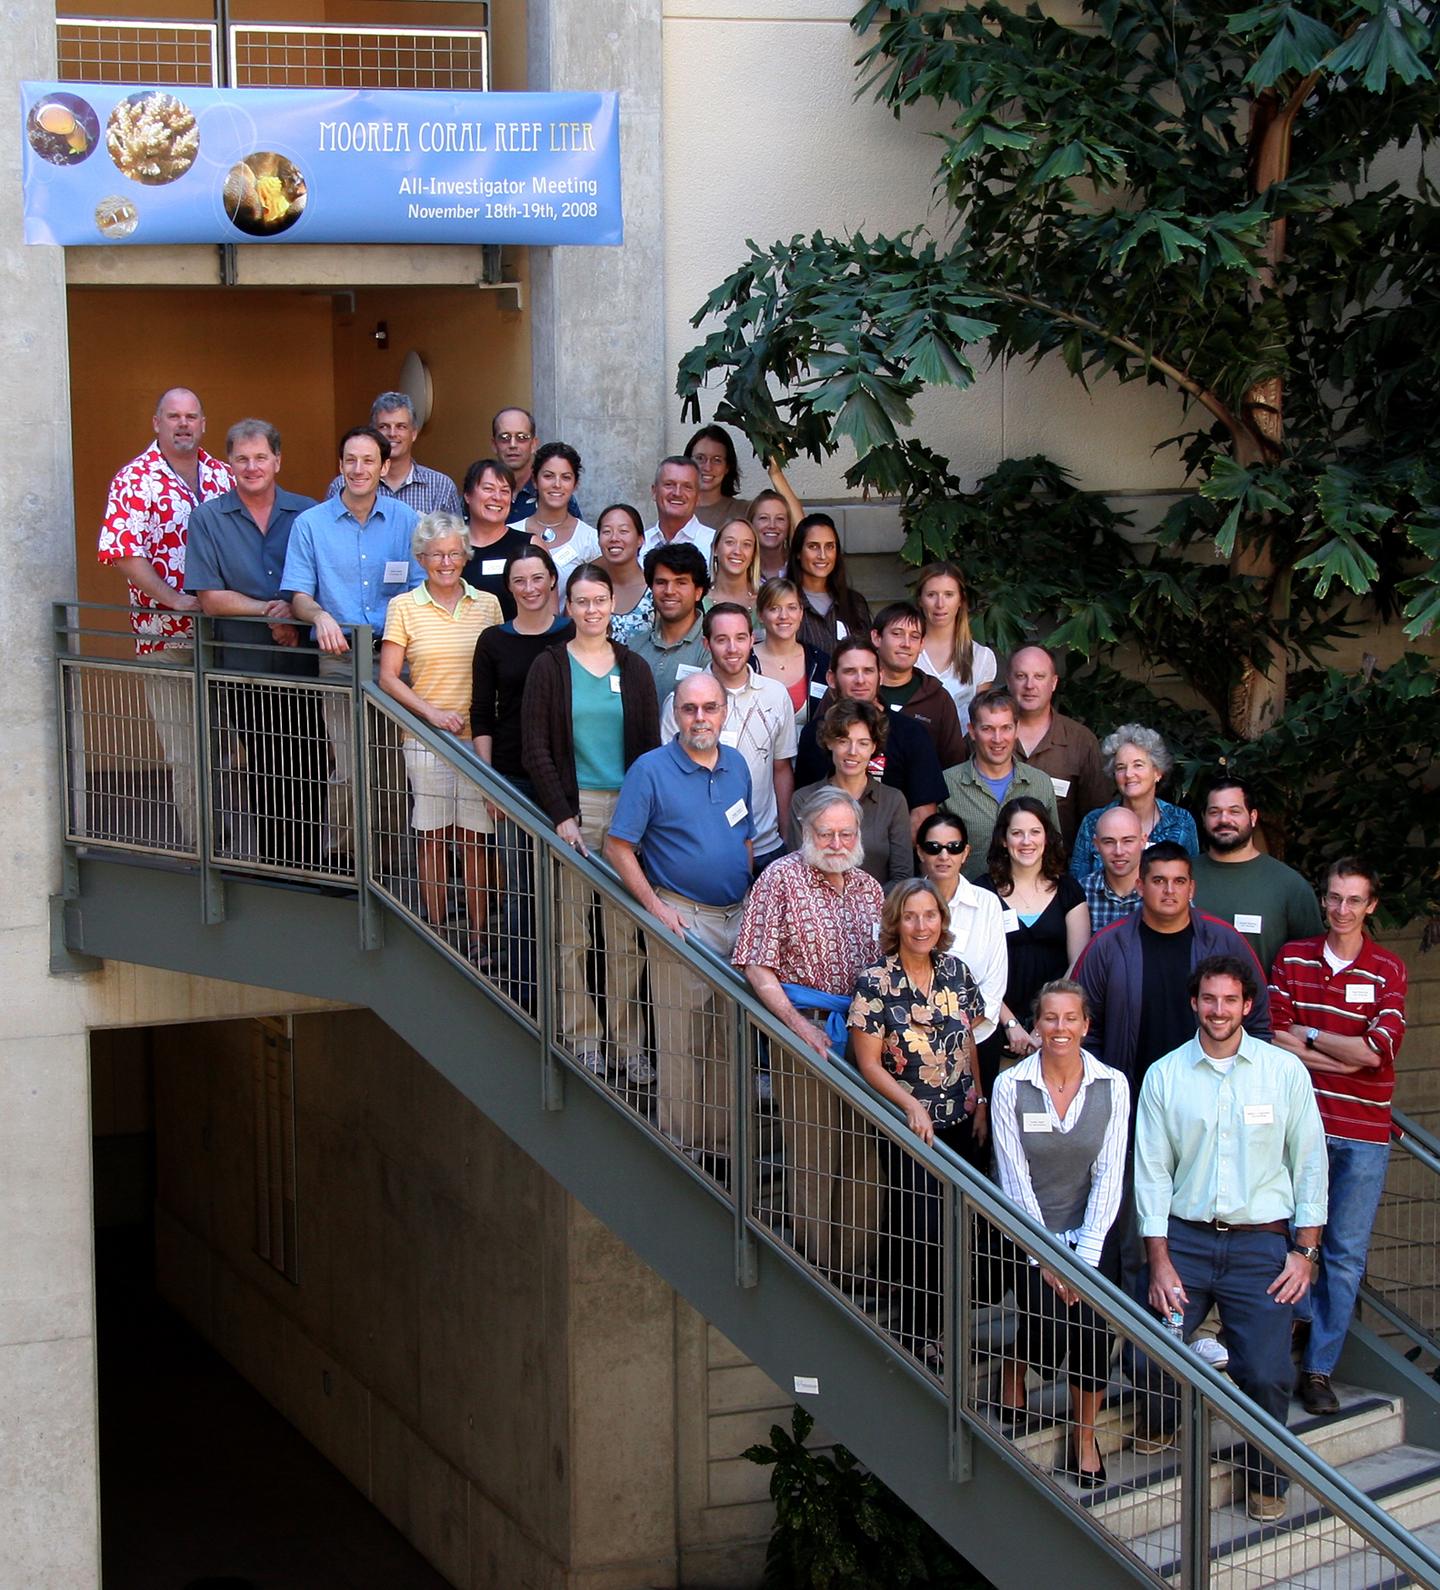 2008 MCR All Investigators Meeting photo